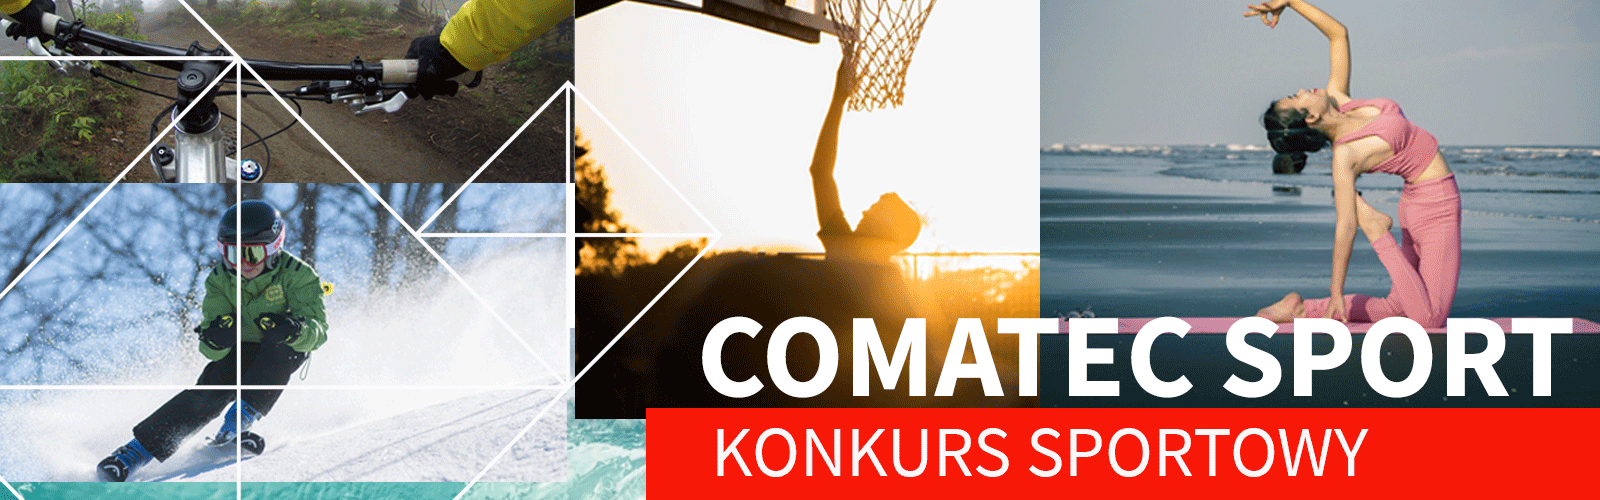 comatec_sport